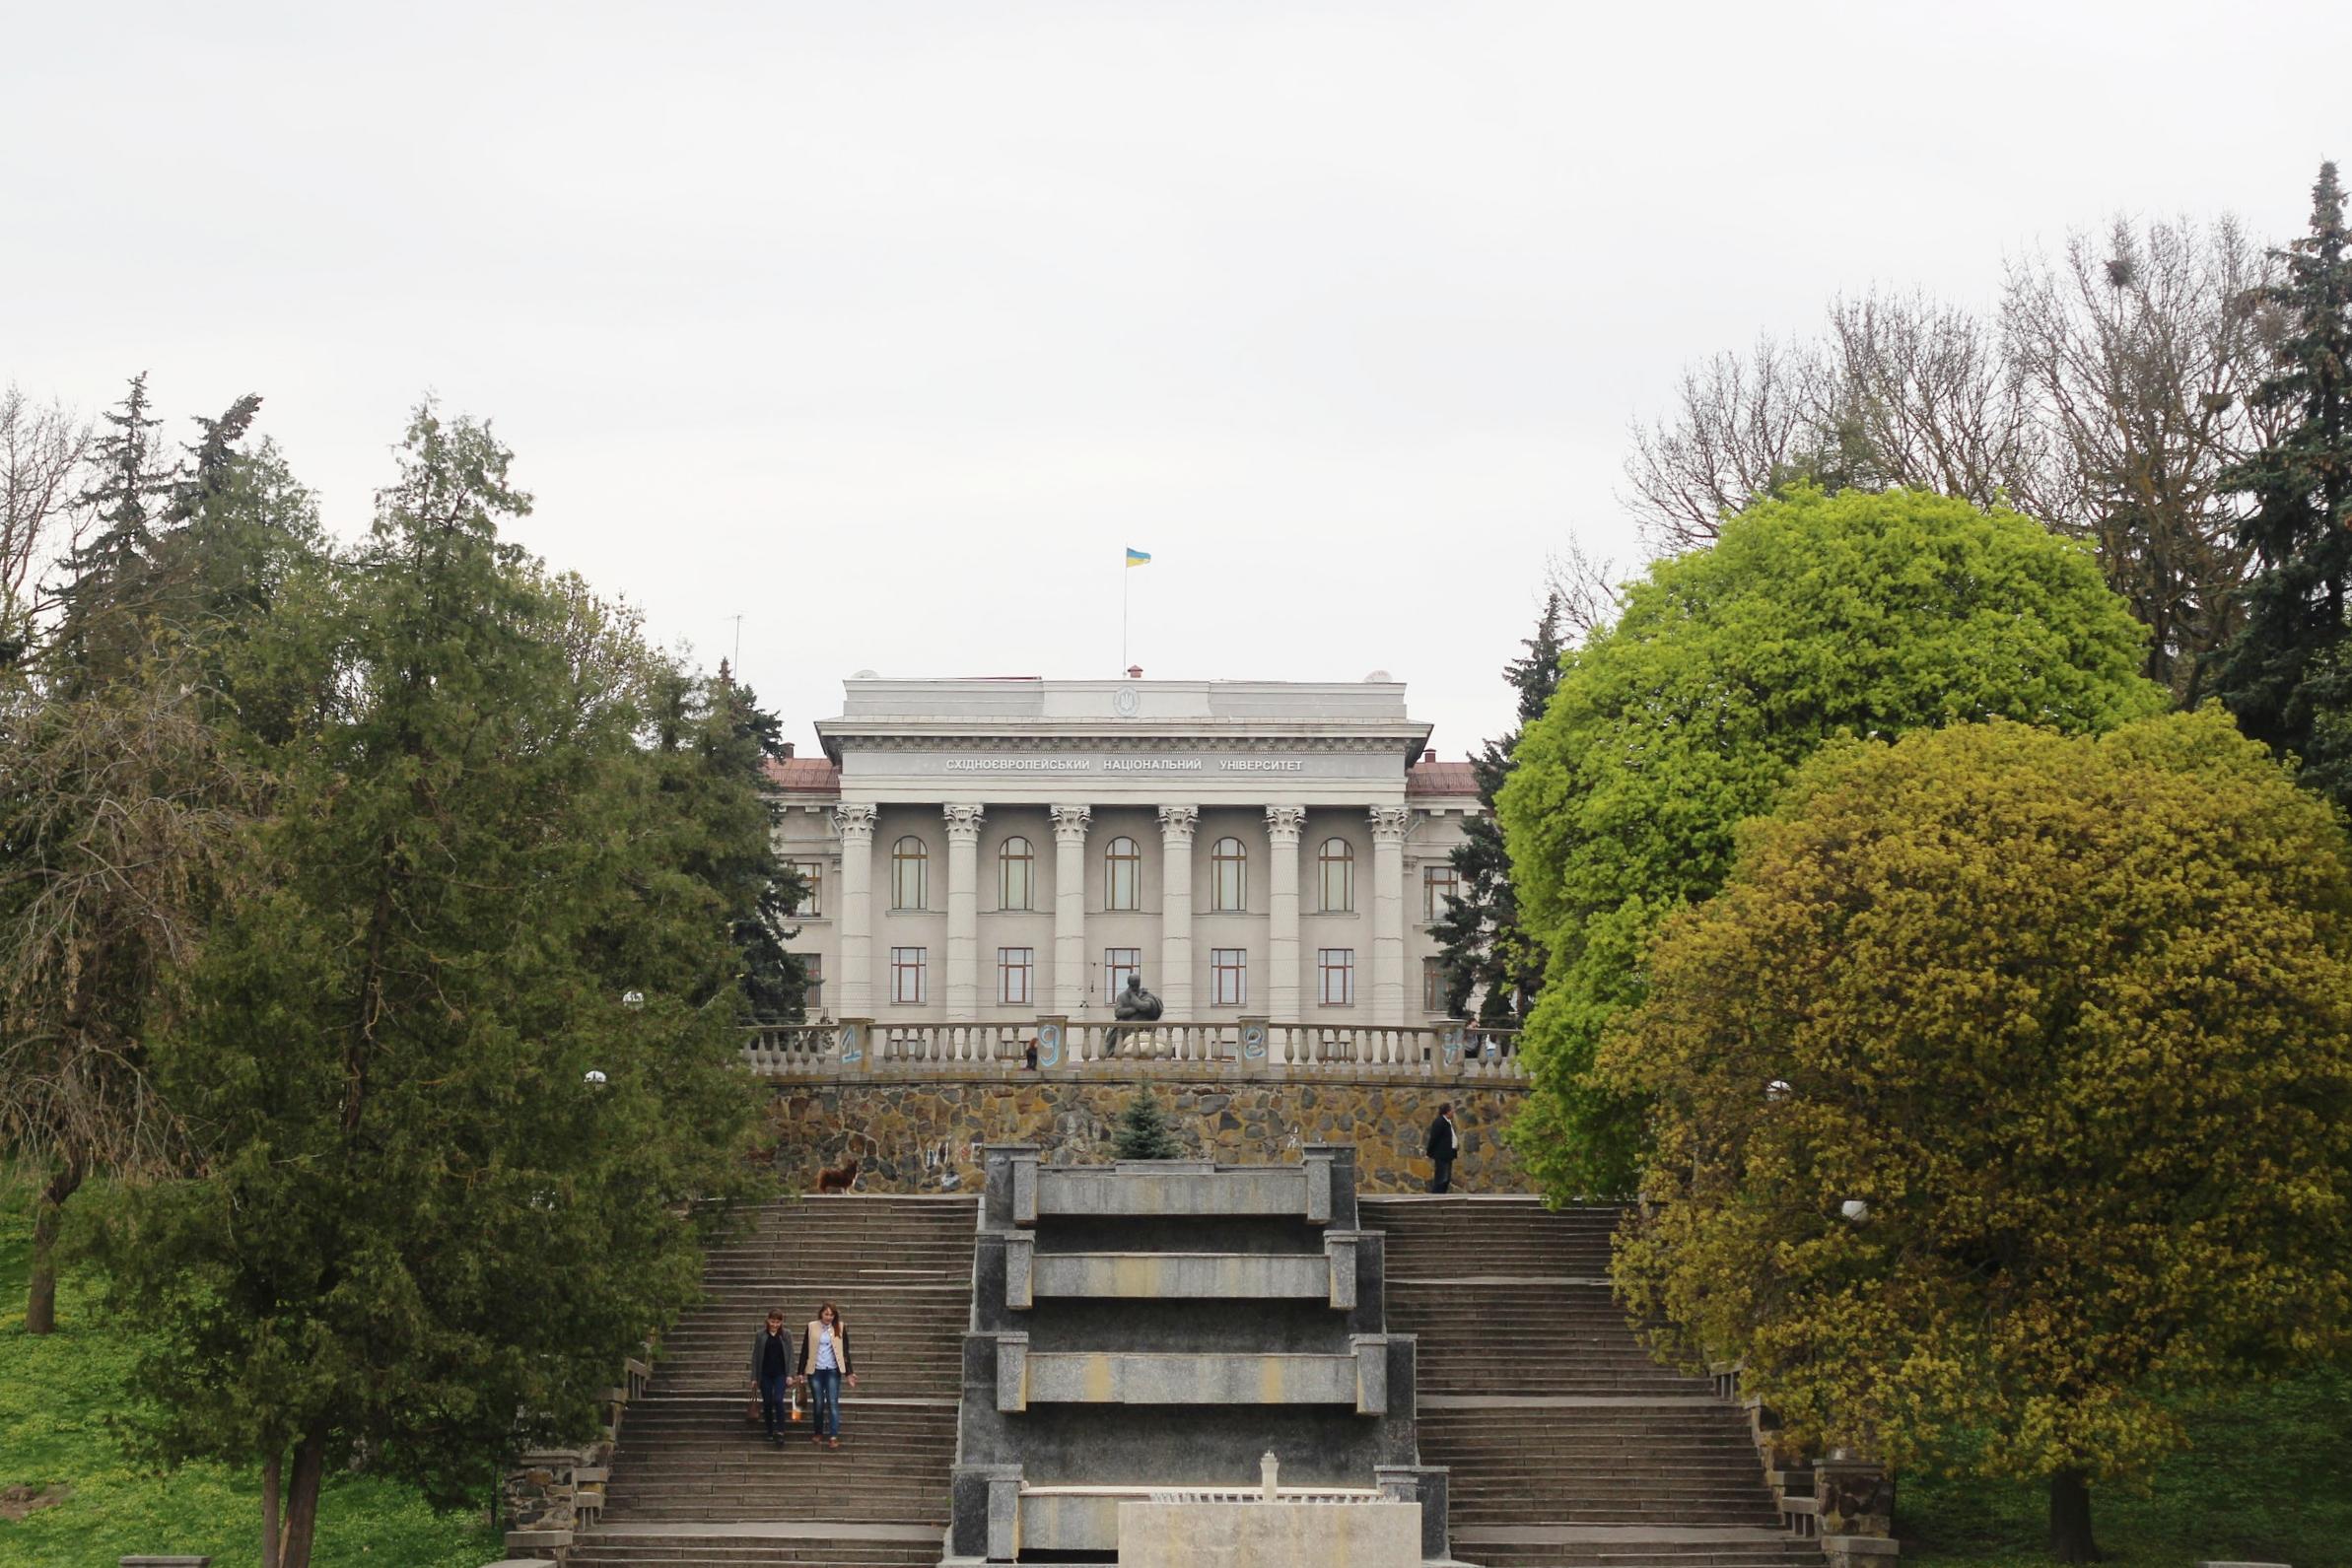 A Taras Shevchenko monument stands in front of the Lesya Ukrainka Eastern European National University. (And, not pictured, a Lesya Ukrainka monument stands in front of the drama theatre, named after Taras Shevchenko.)